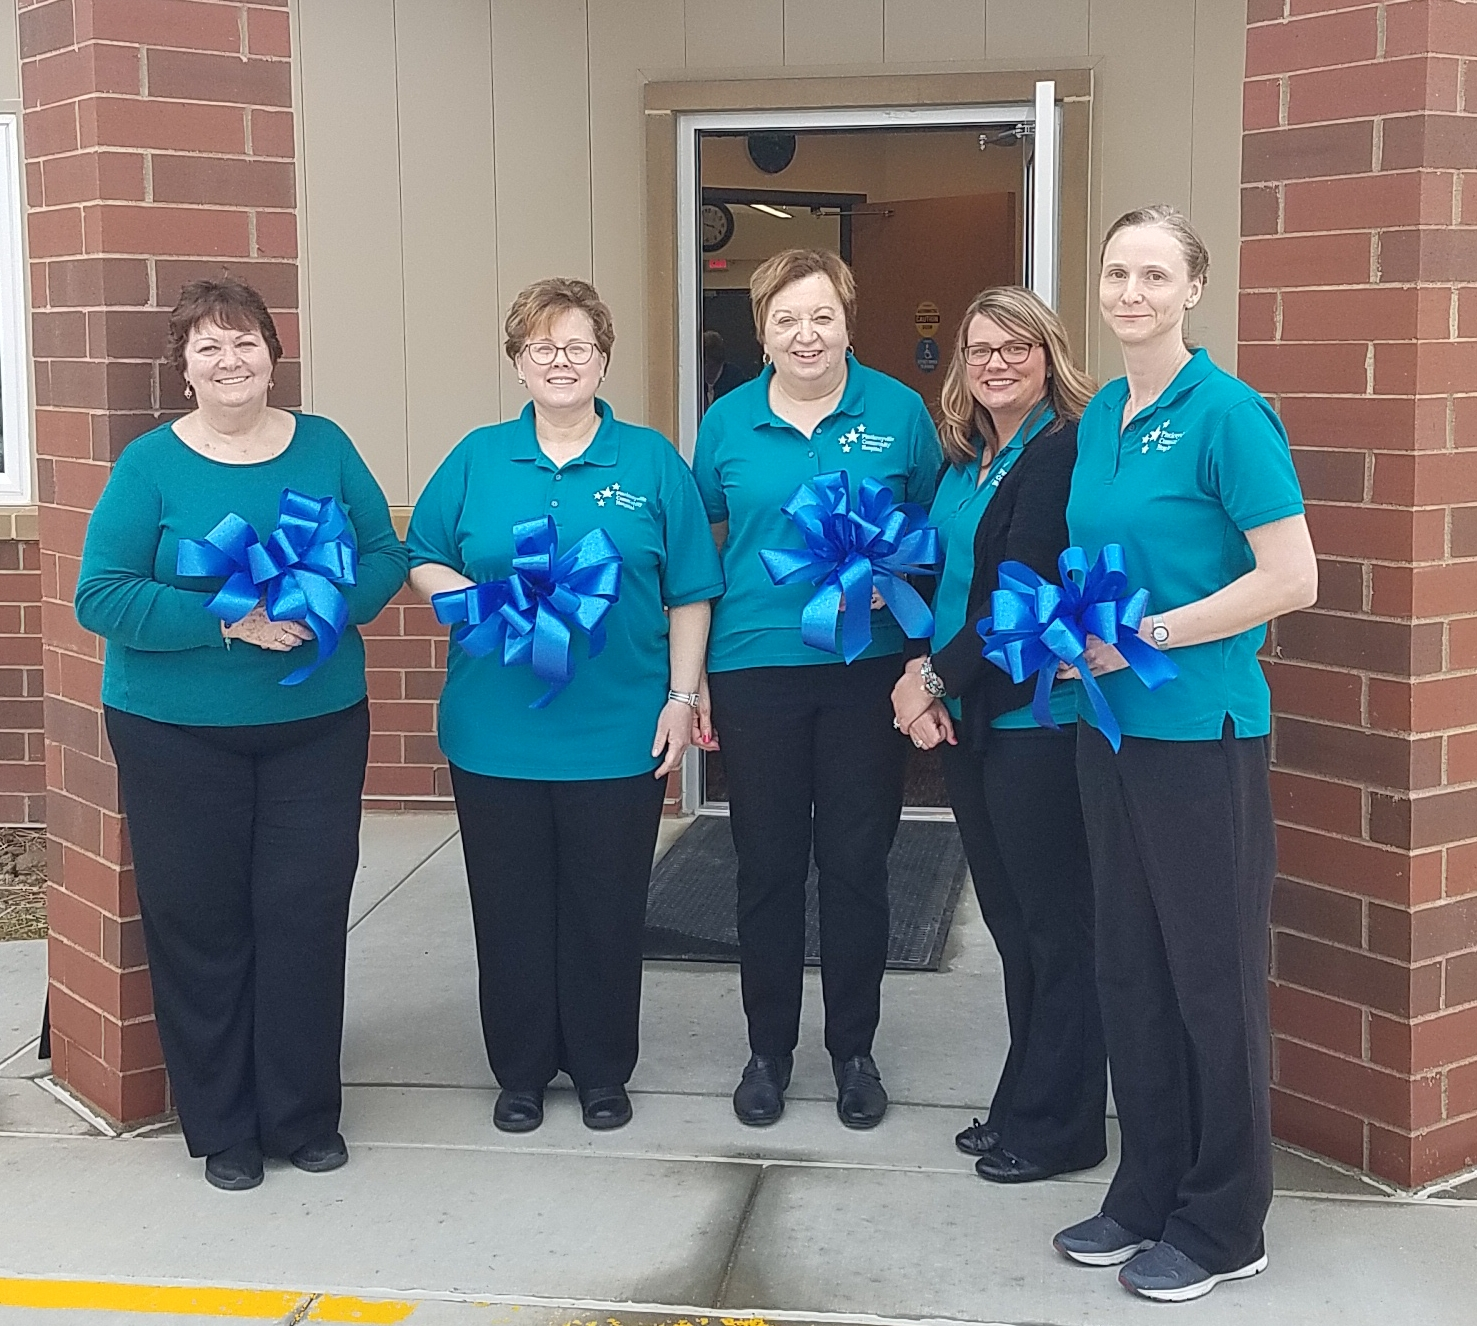 Left to right: Diana Womack-Walters LCSW; Deborah Kellerman RN BSN (program Director); Brenda Epplin RN; Brittany Heisner Unit Clerk; Laura Herzog LCPC